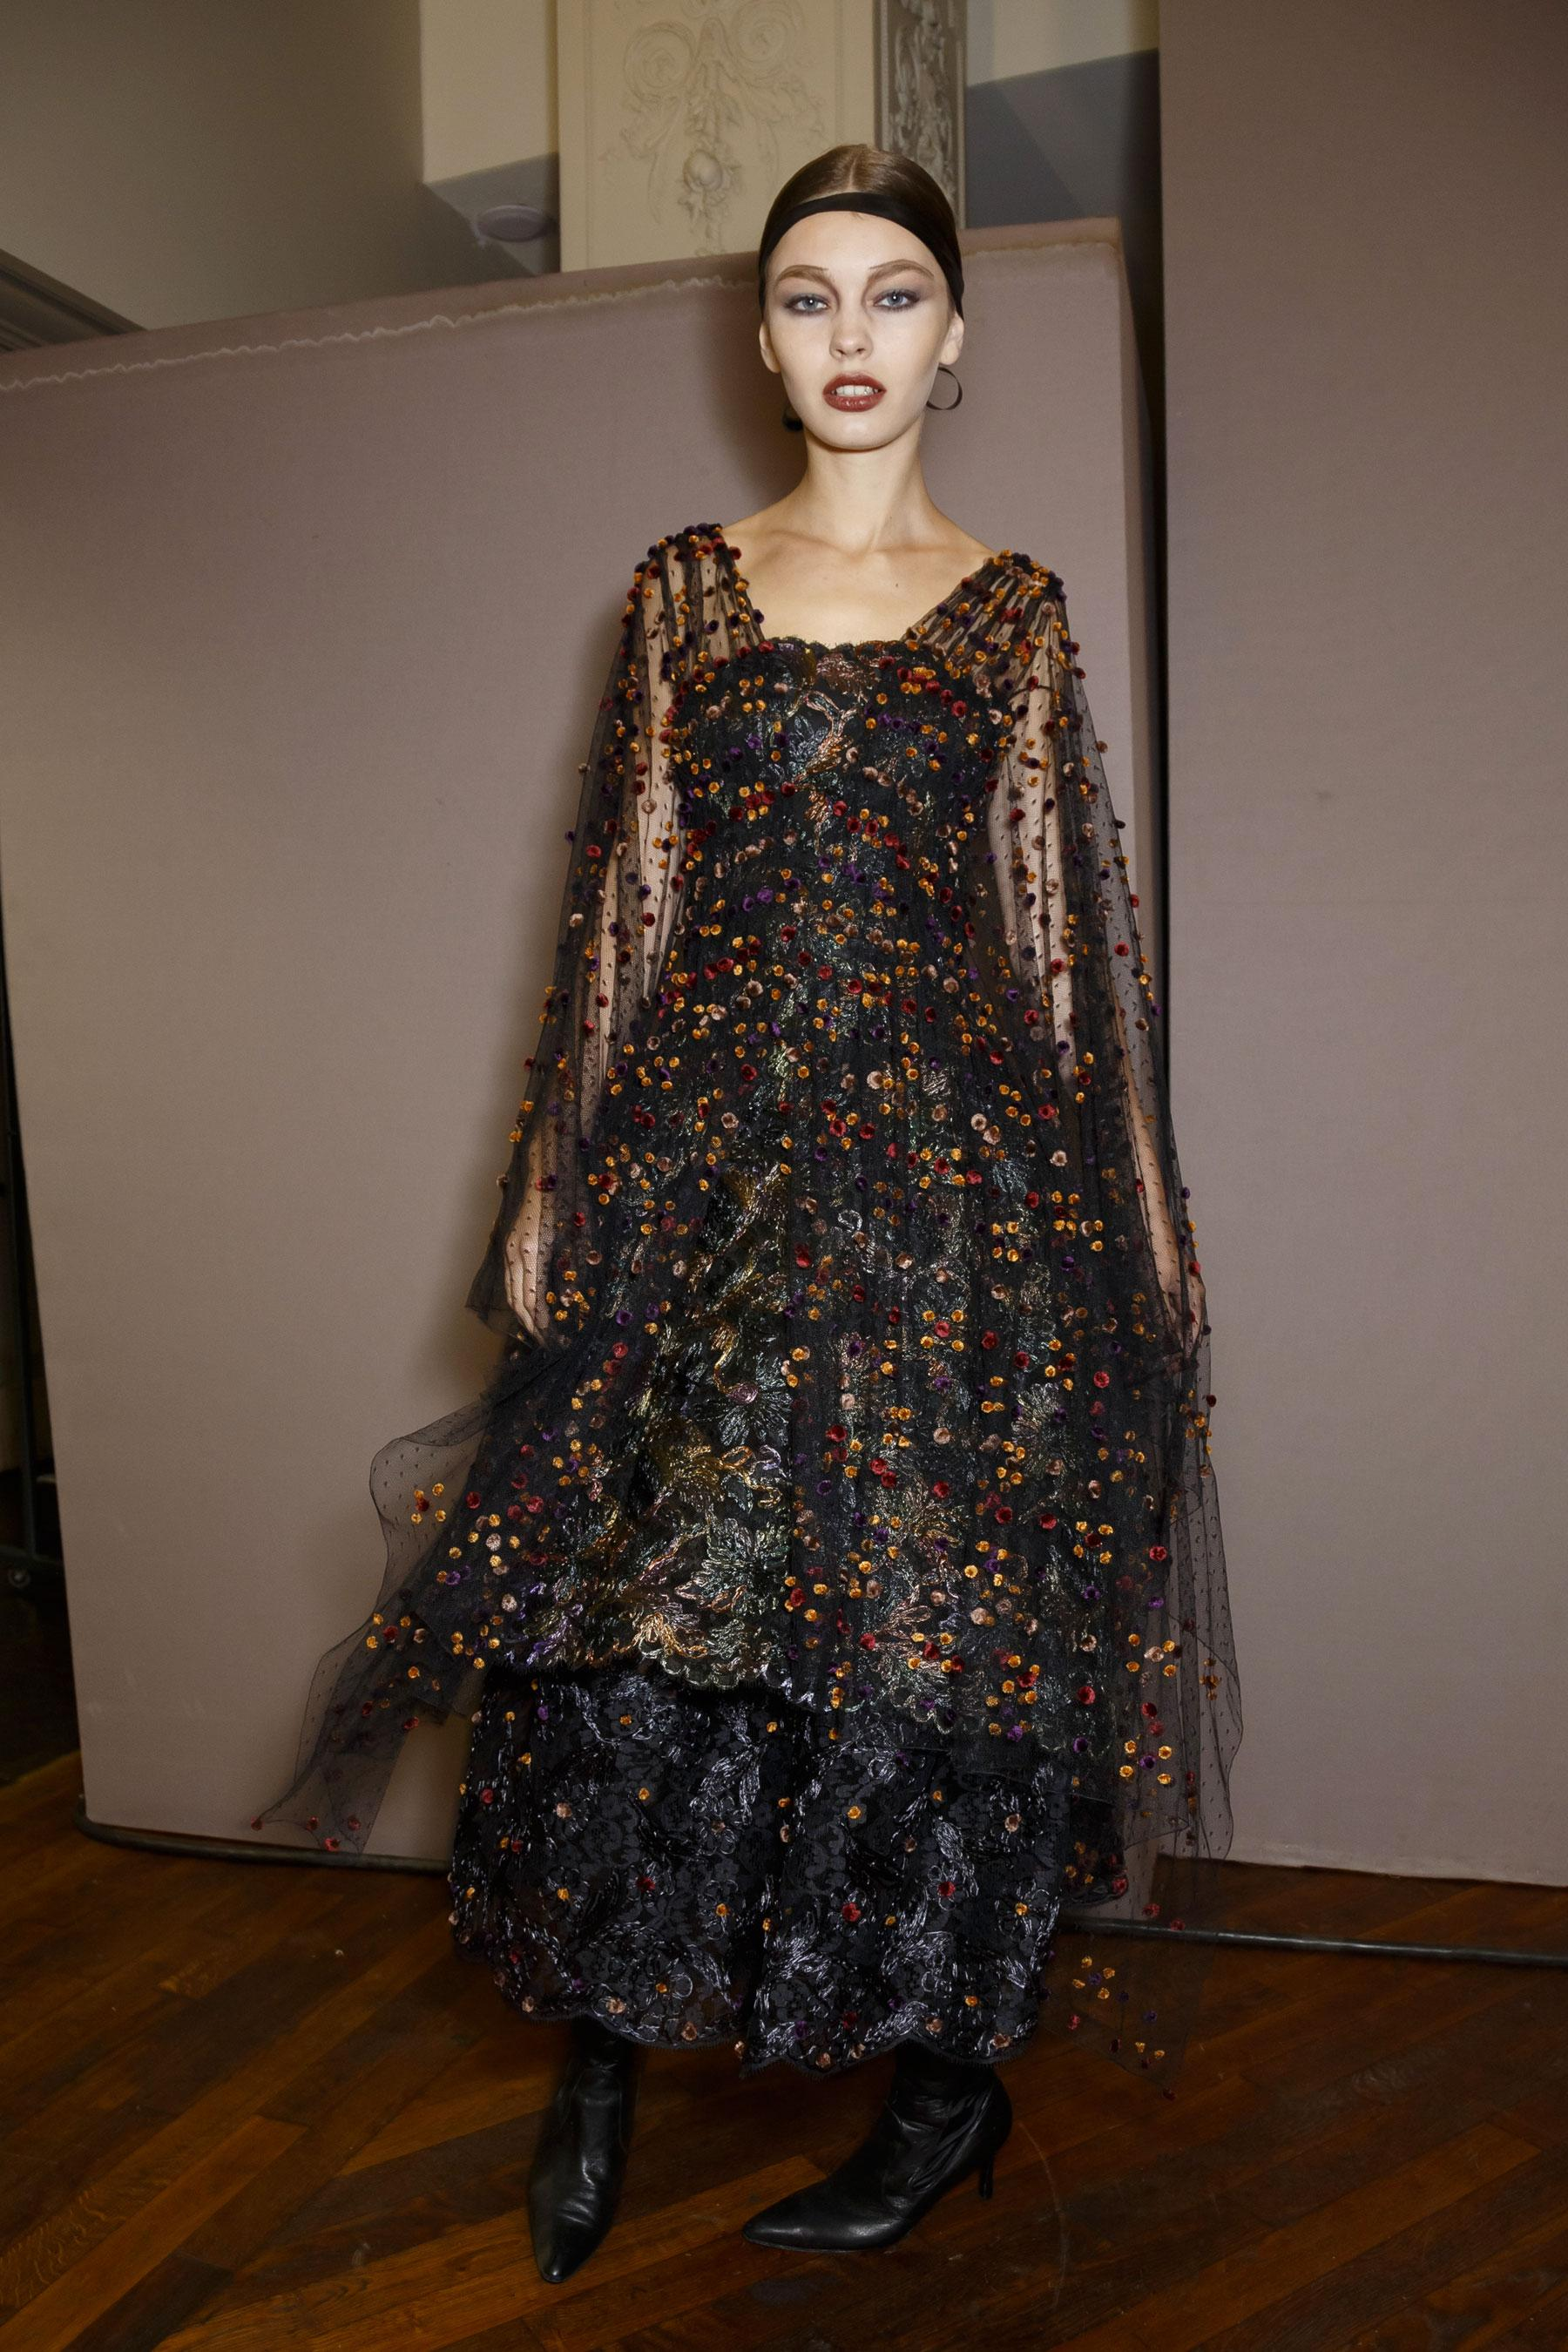 D fil franck sorbier automne hiver 2014 2015 couture for 1900 haute couture